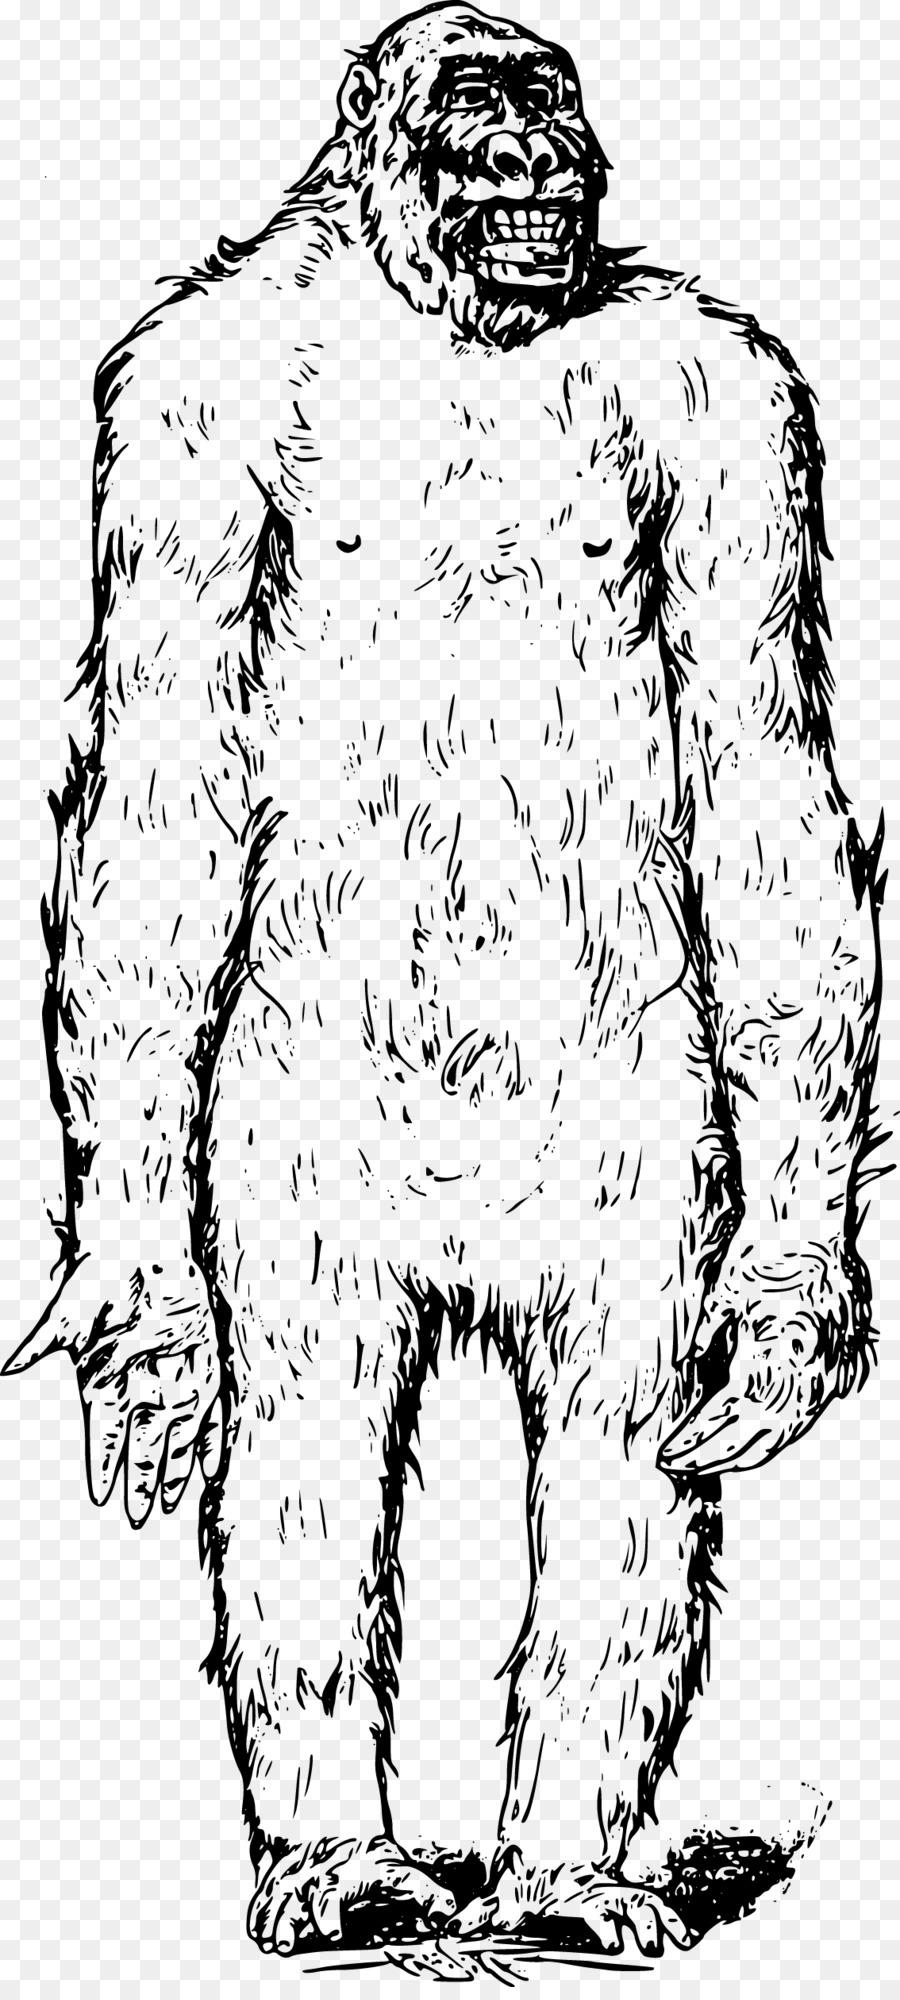 900x2000 Bigfoot Ape Clip Art